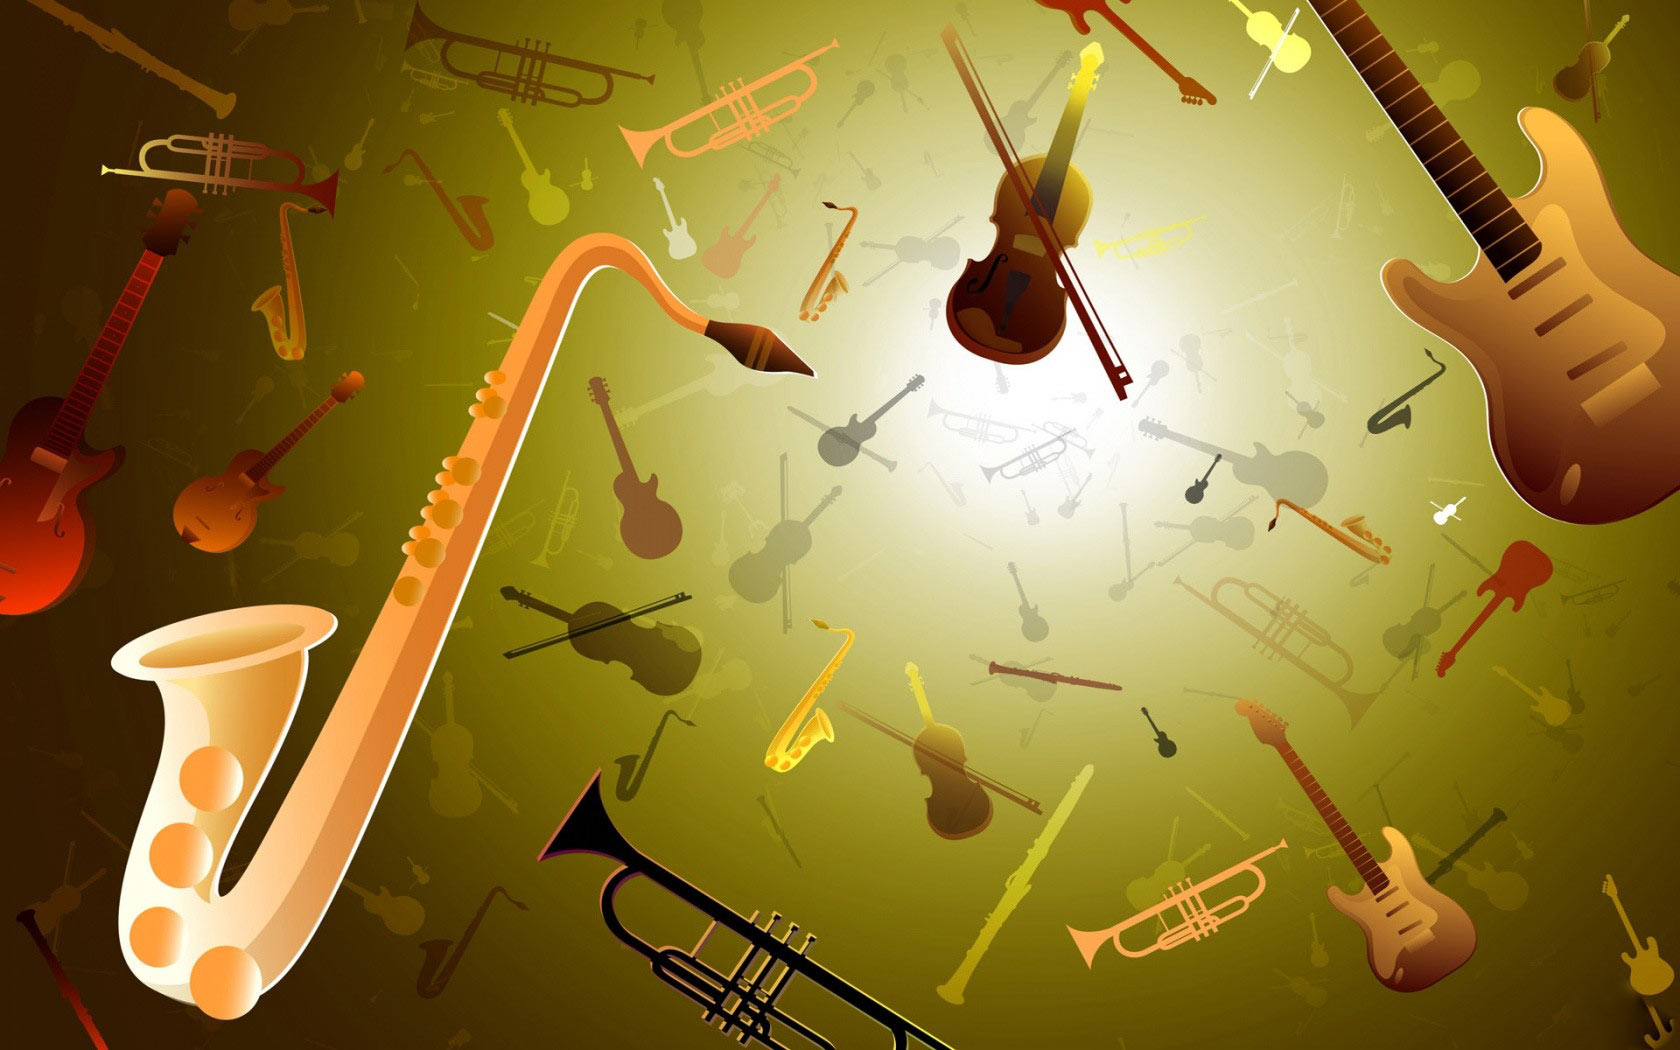 Wallpapers Hd 3d Music: 3D Jazz Music Wallpapers